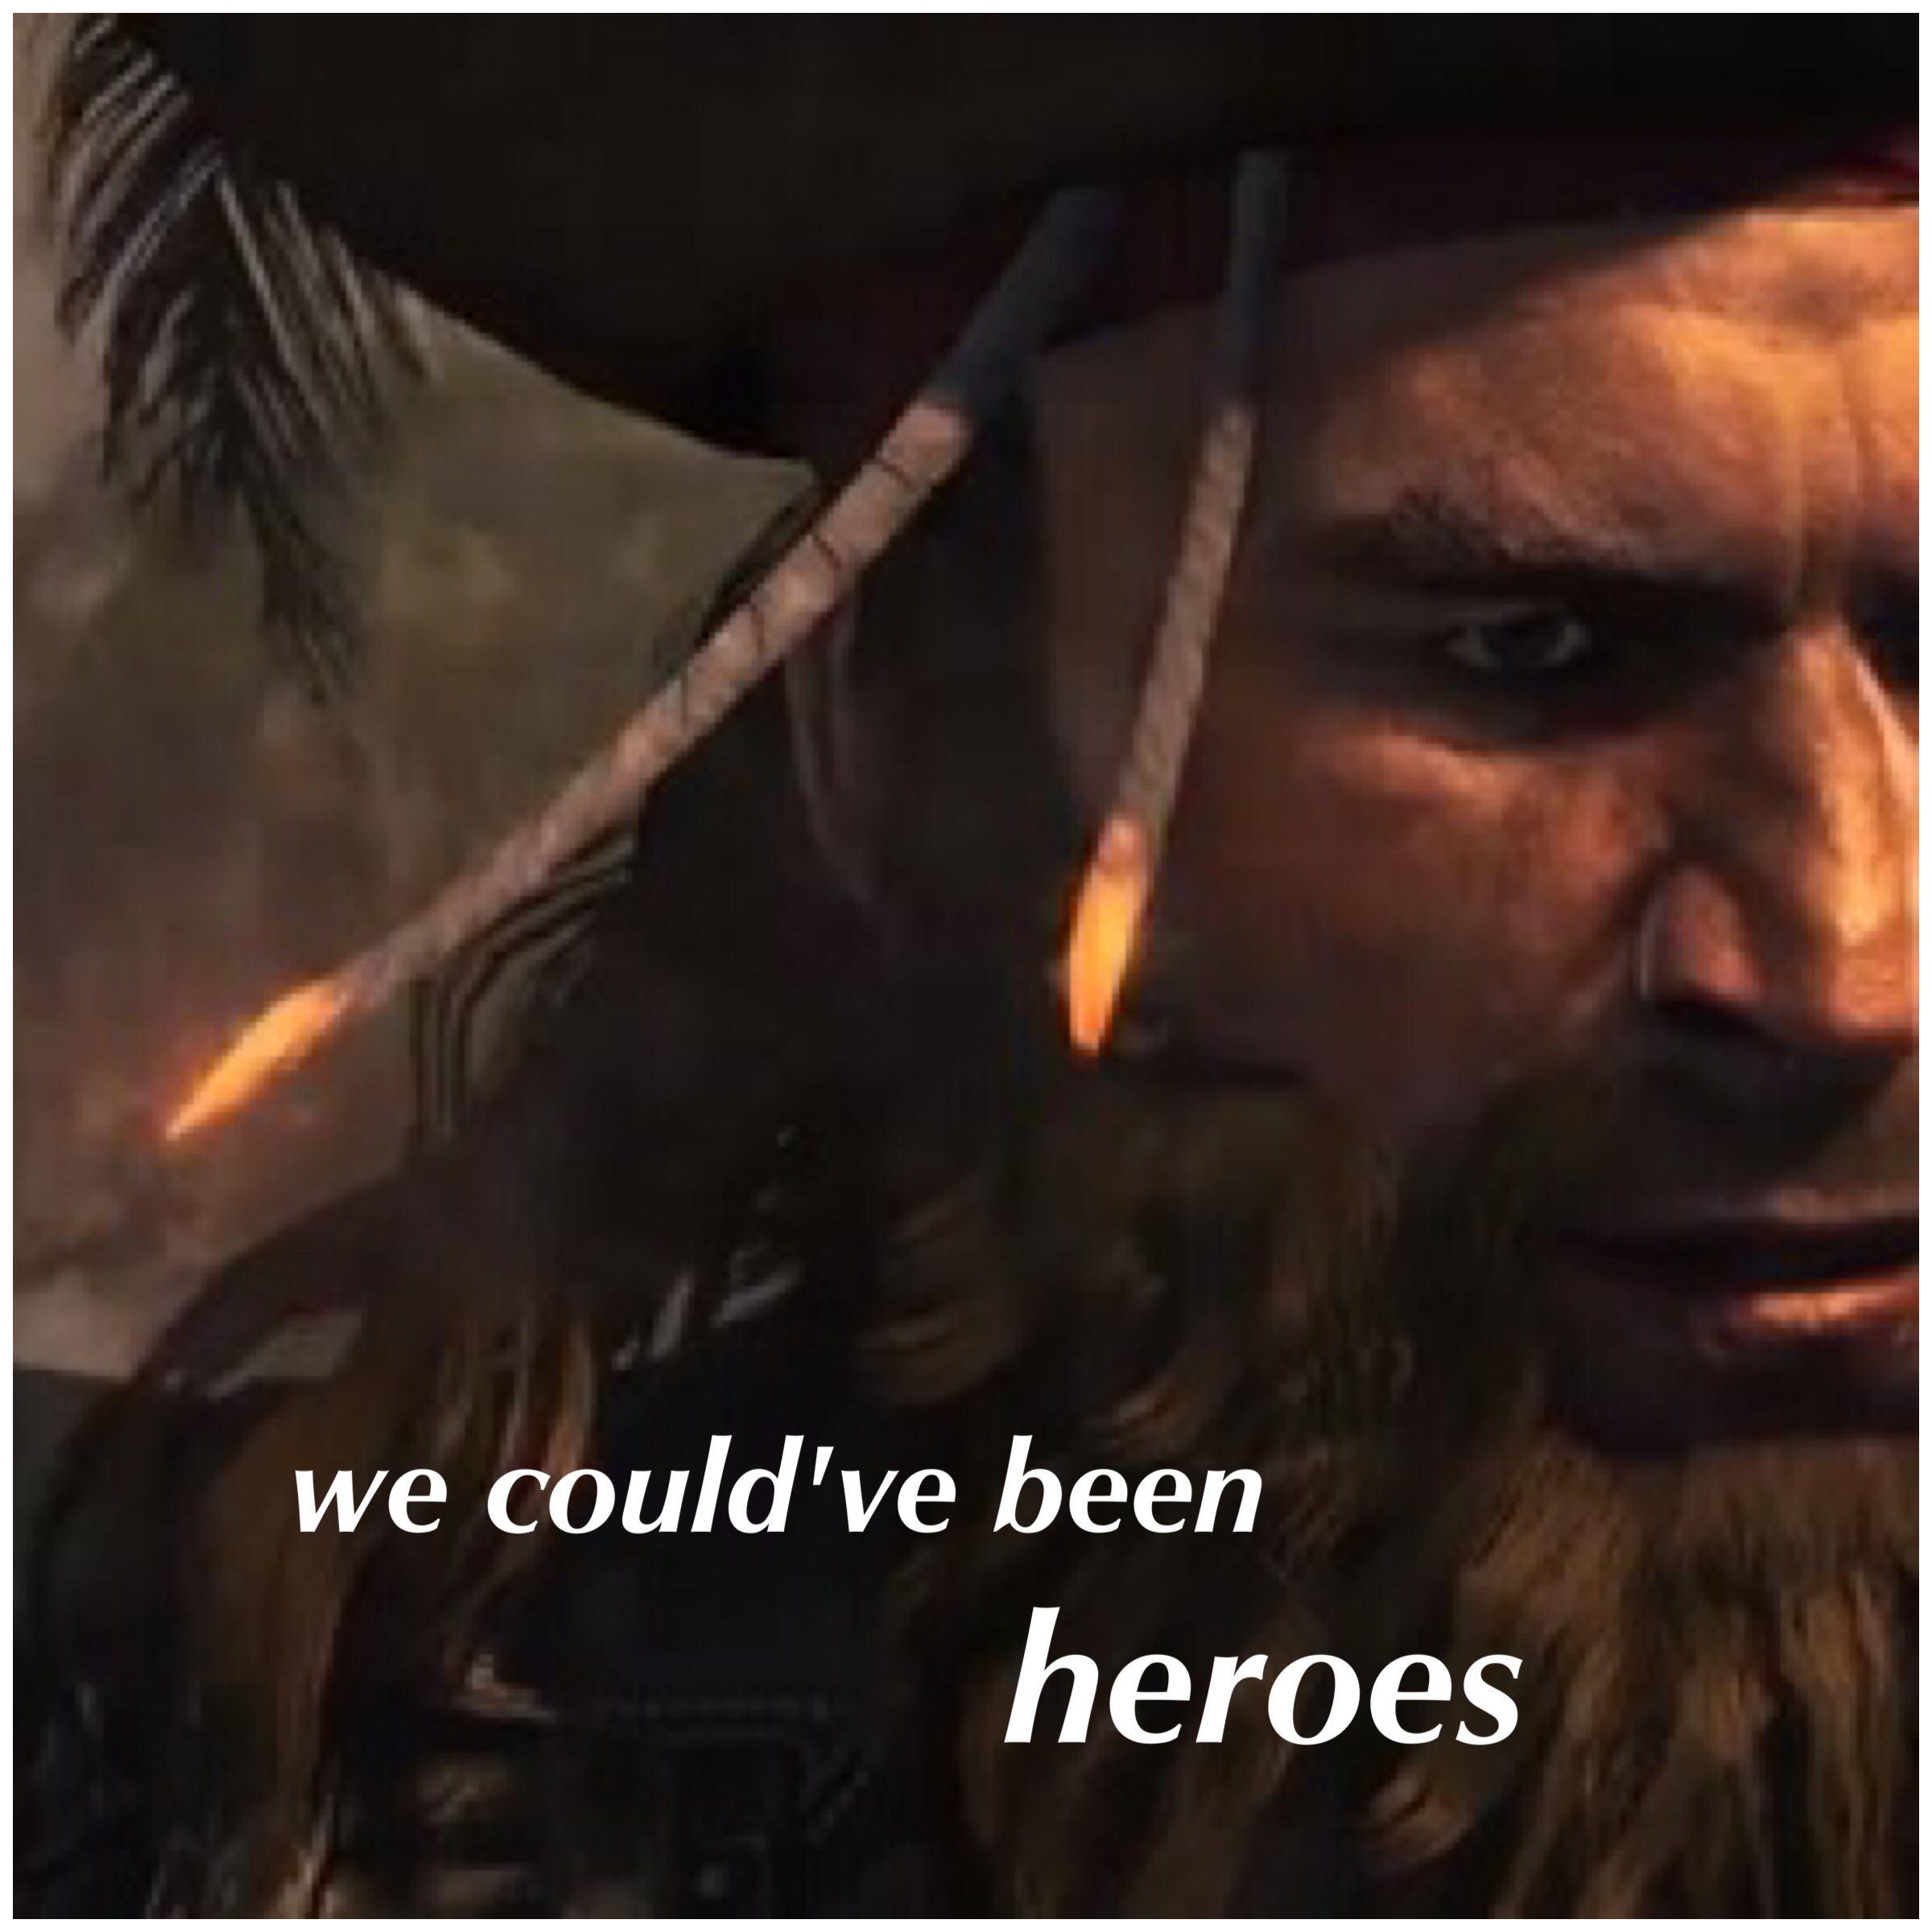 Assassin S Creed Quote Wallpaper Assassin S Creed 4 Black Flag Blackbeard